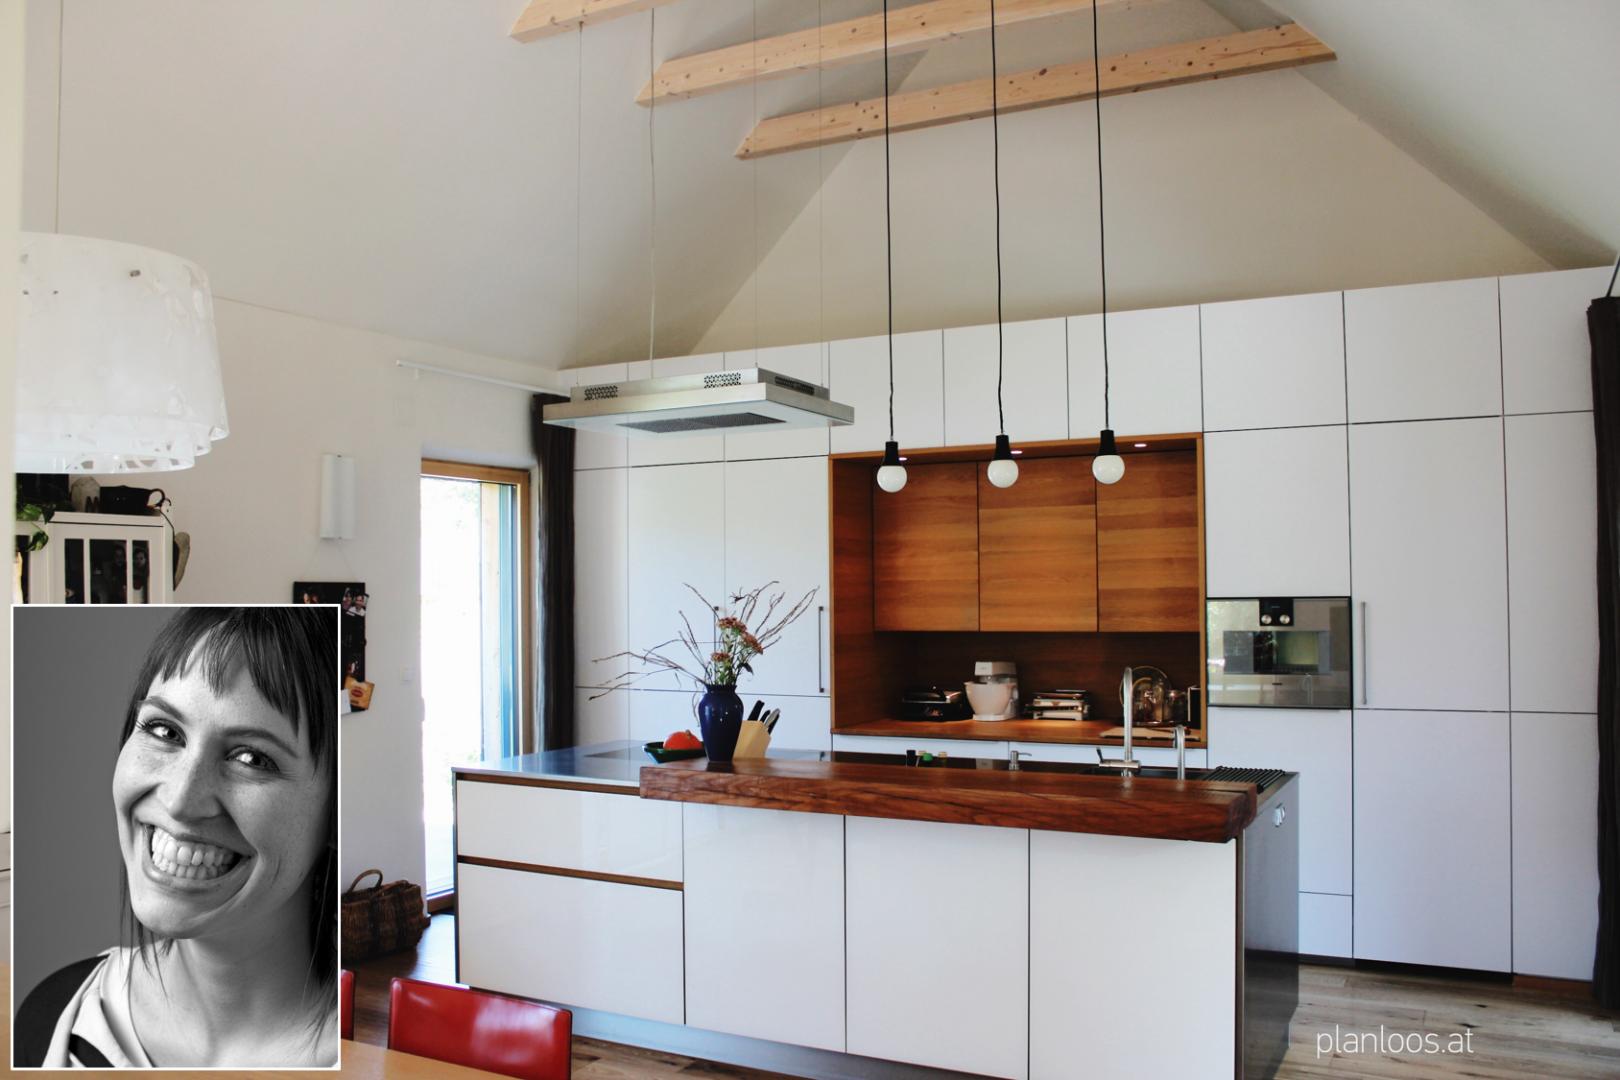 5 tipps f r hohe r ume hipster home. Black Bedroom Furniture Sets. Home Design Ideas